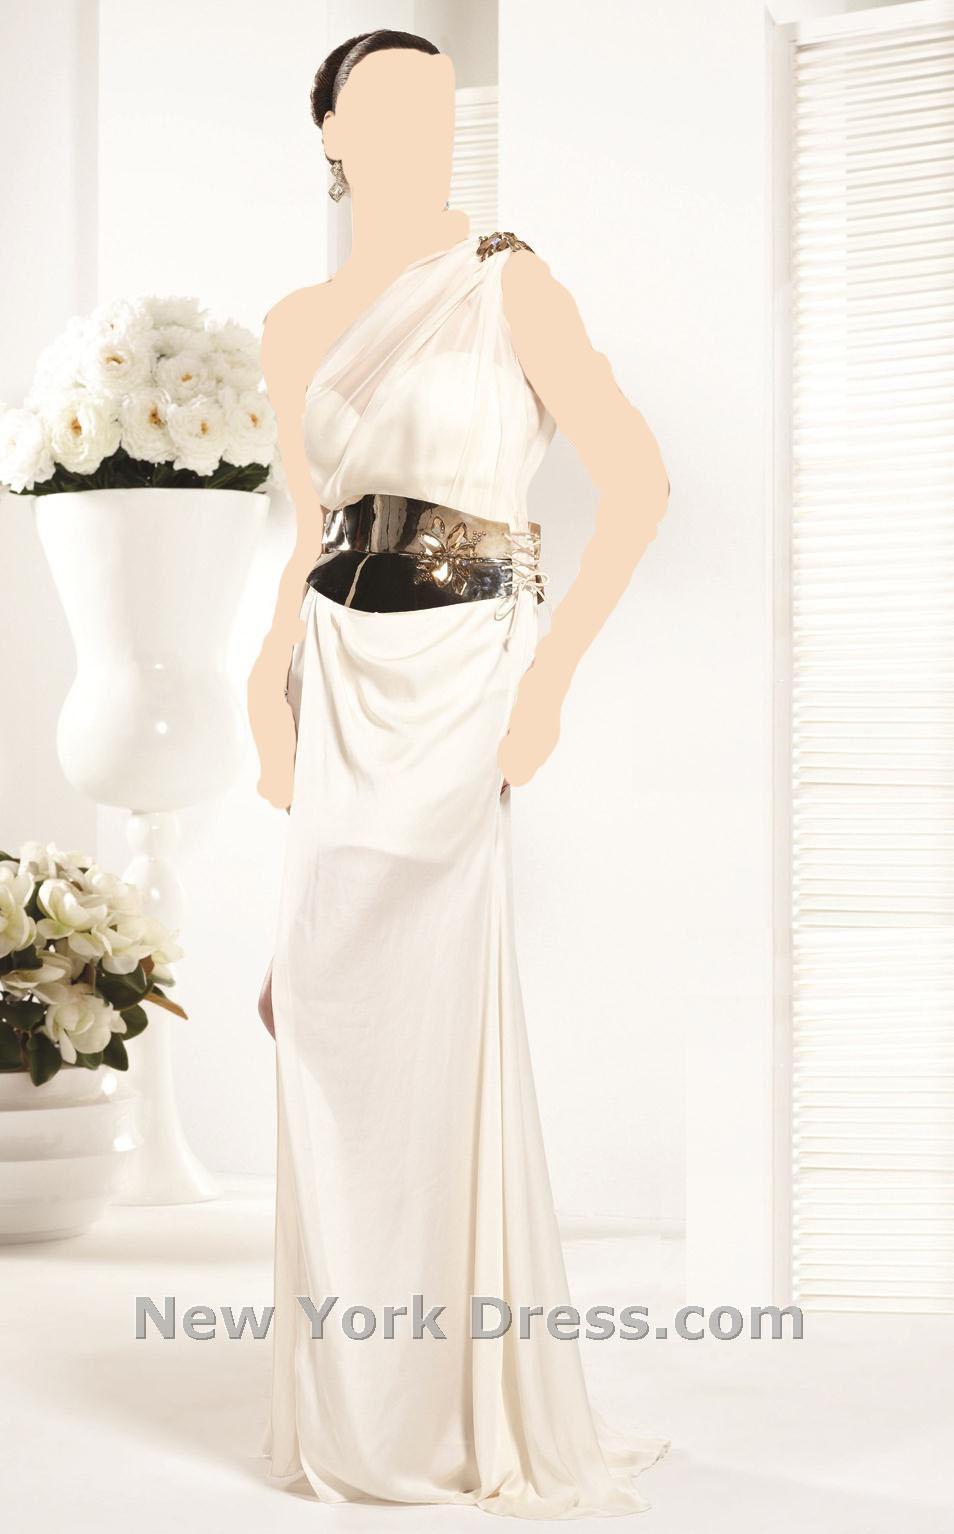 dresses long 2 فساتين سهره روعه evening dresses 1